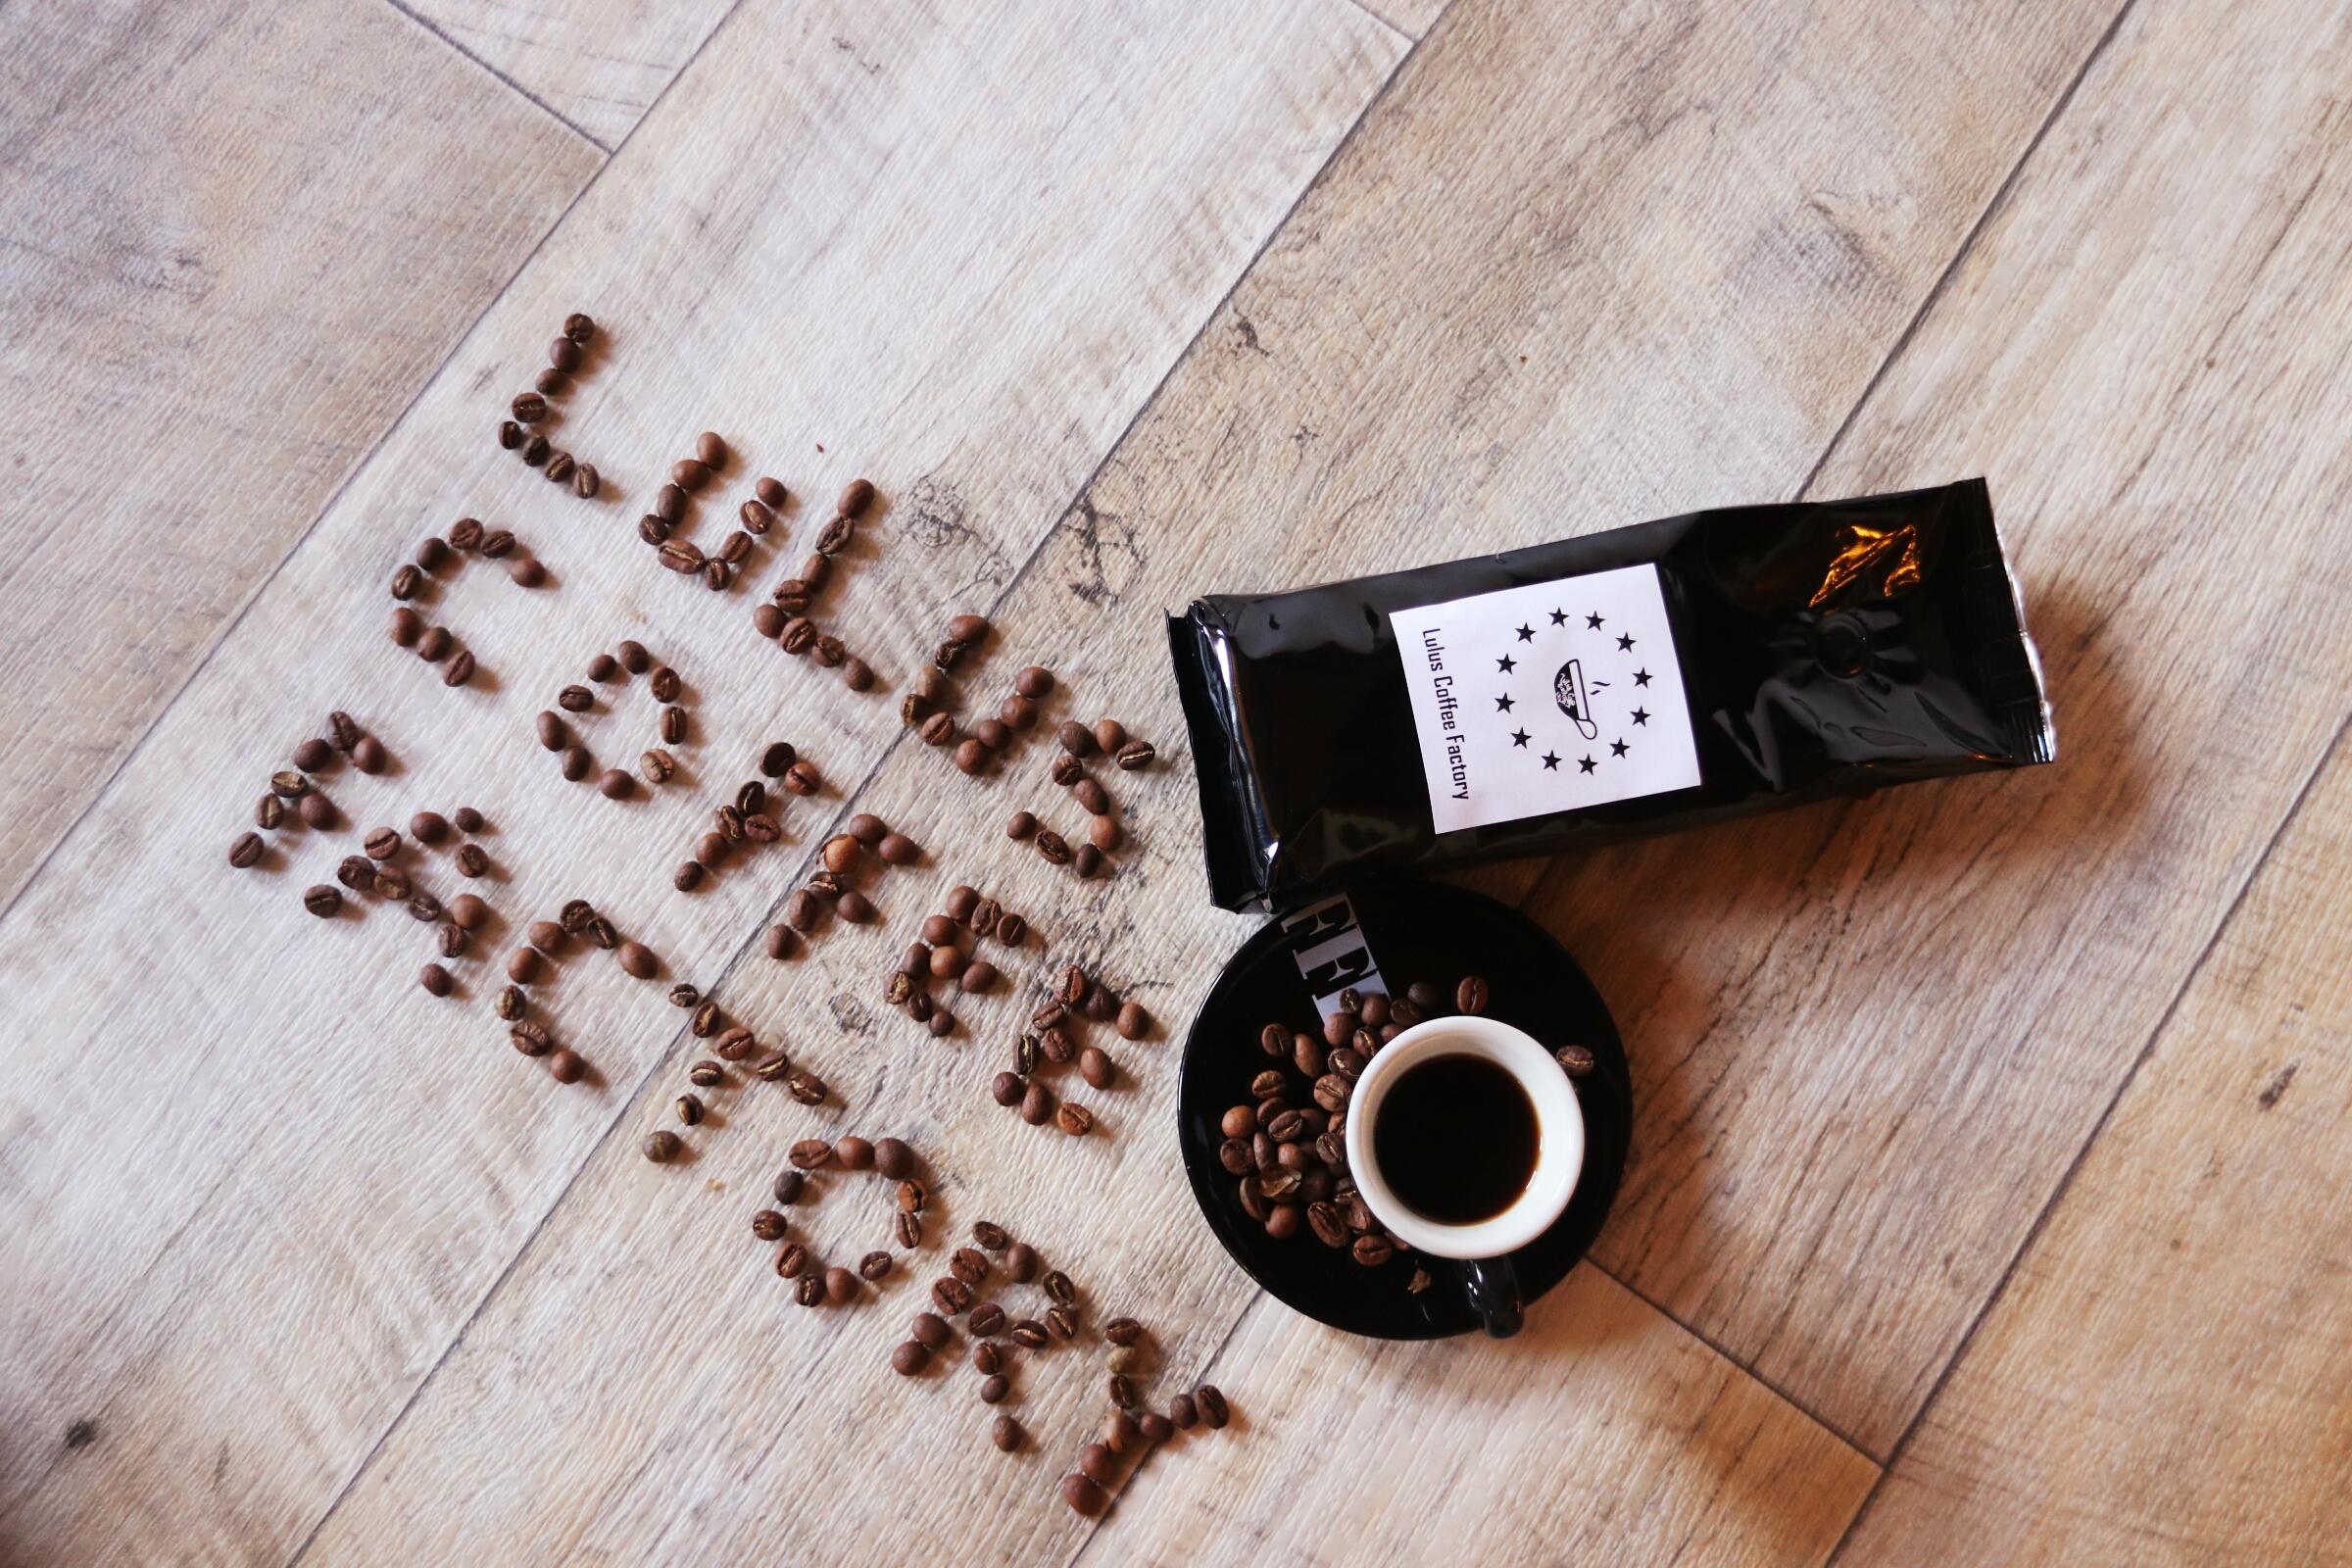 Kaffee - Aber wie?